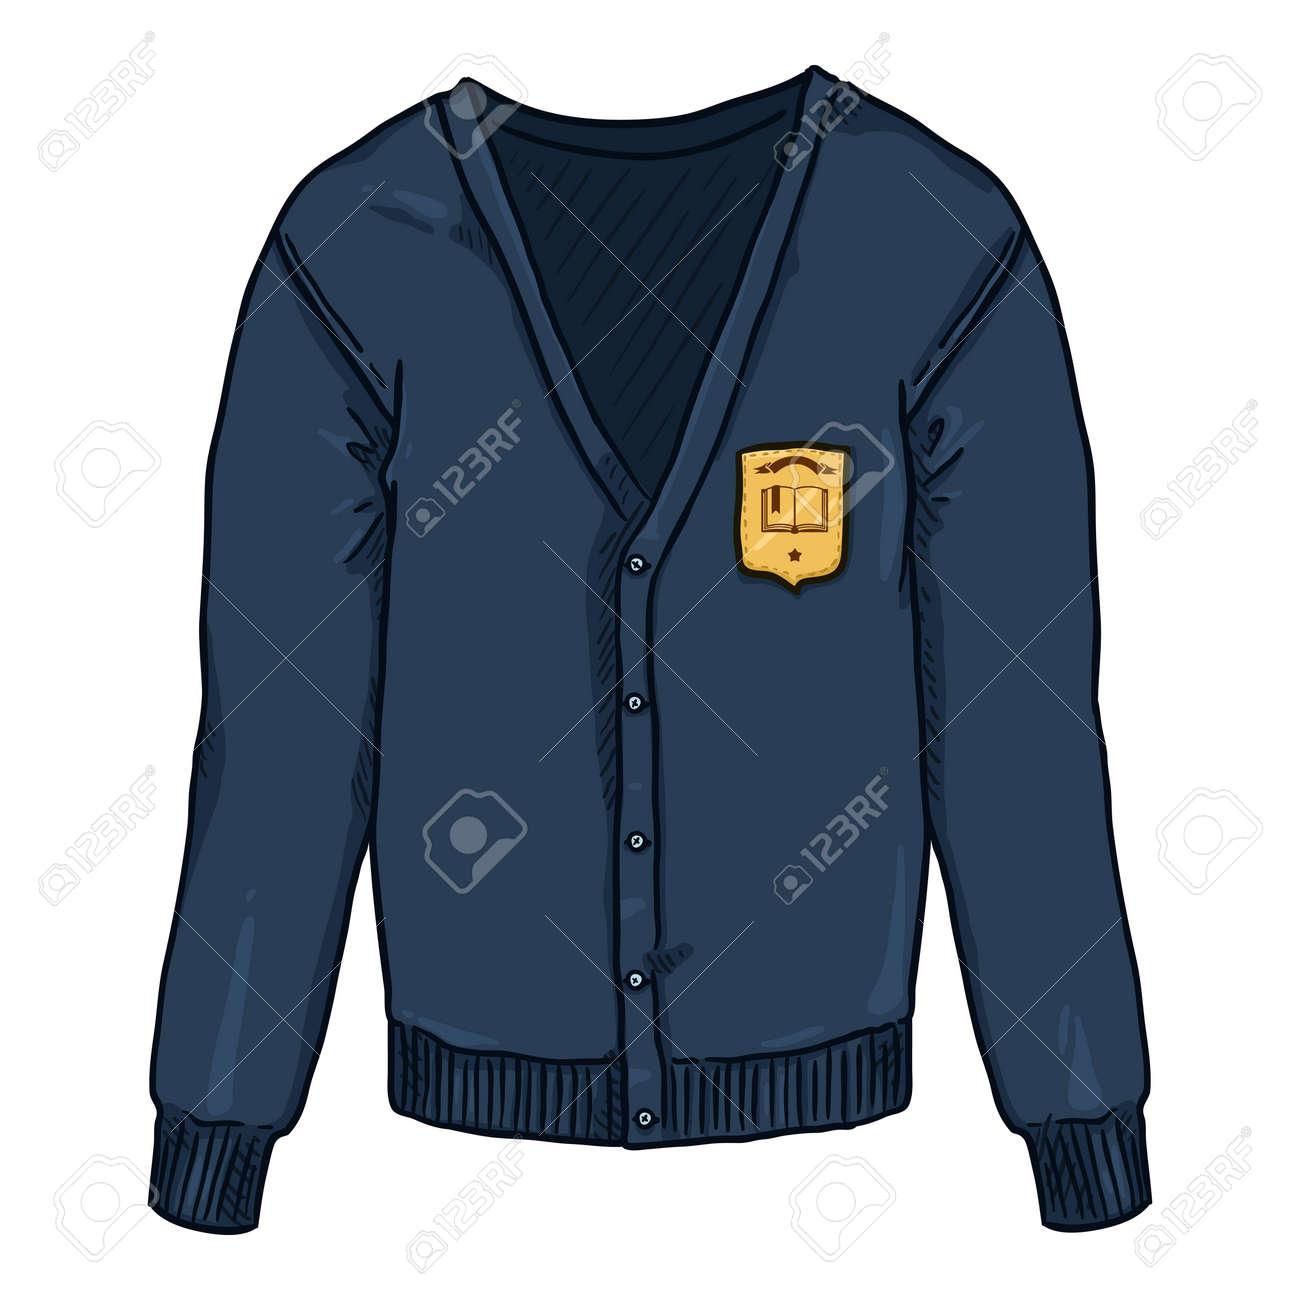 Blue Cardigan with School Badge. Vector Cartoon School Uniform Illustration. - 169663683